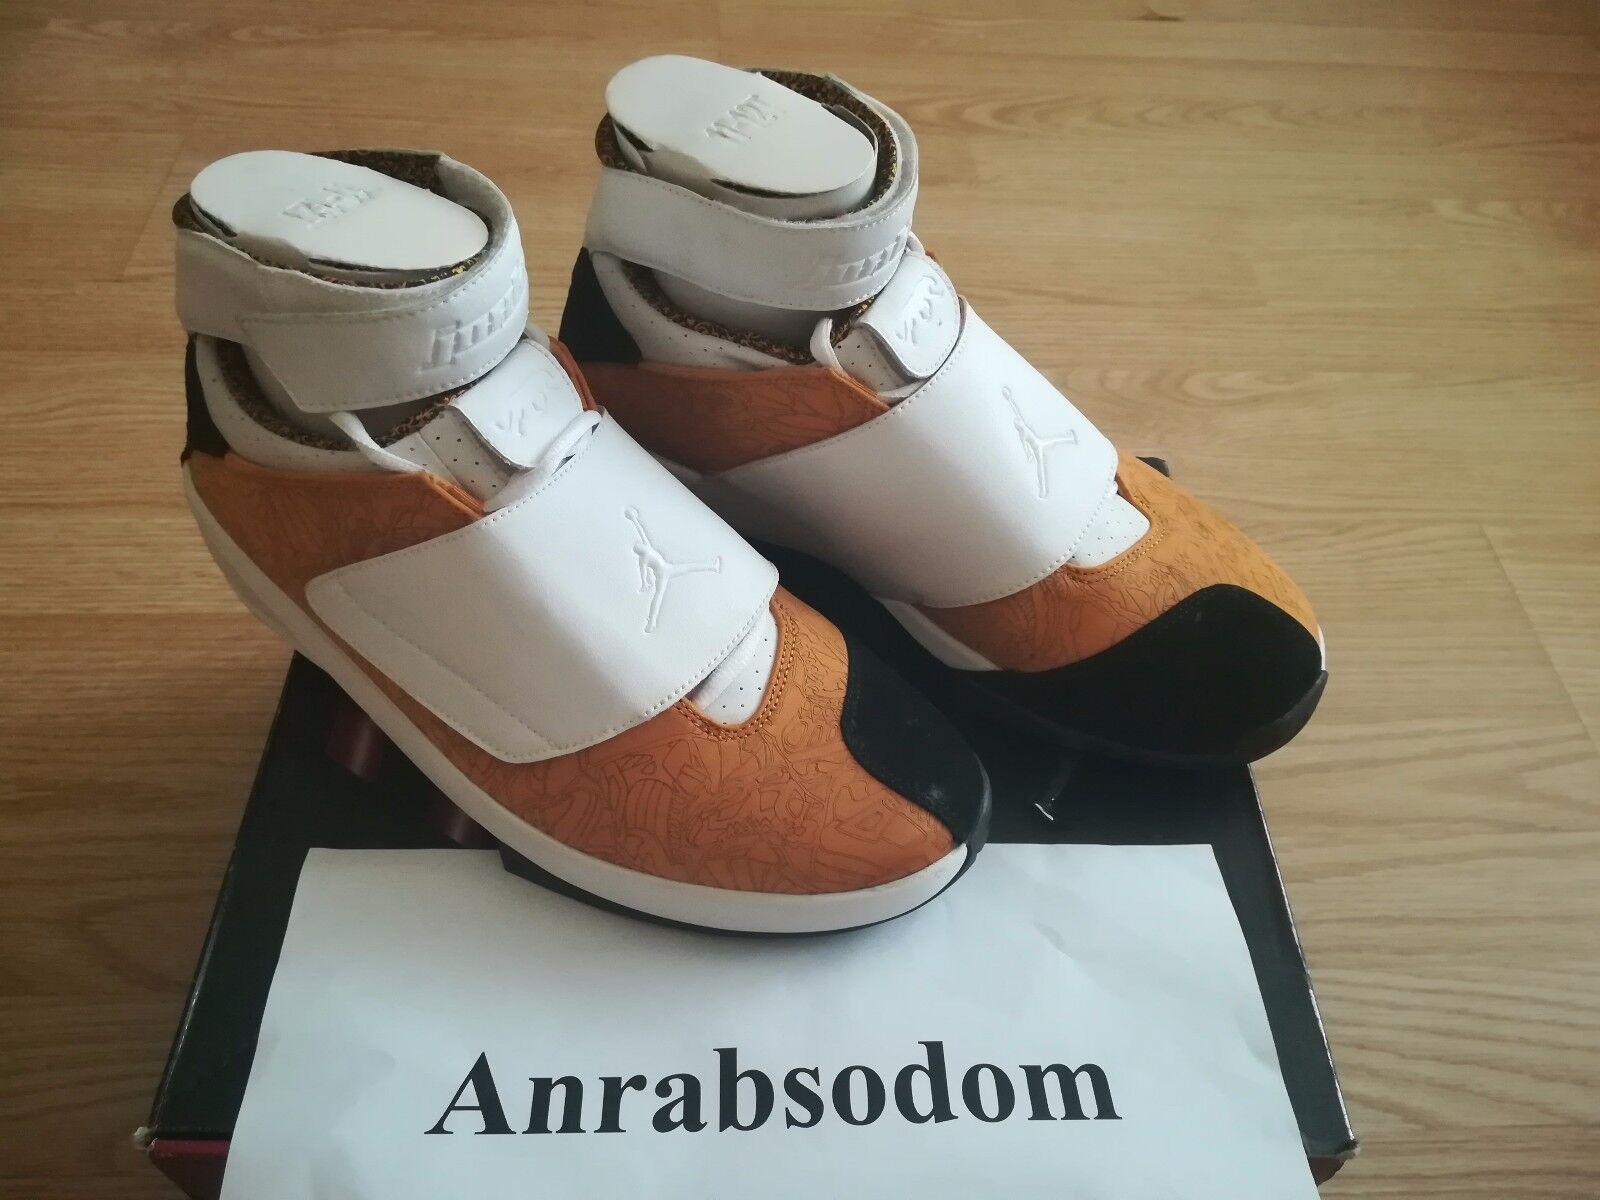 Nike Air Jordan XX 20 Chutney 2005 OG East Coast (310455 711) size: UK10-US11-EU